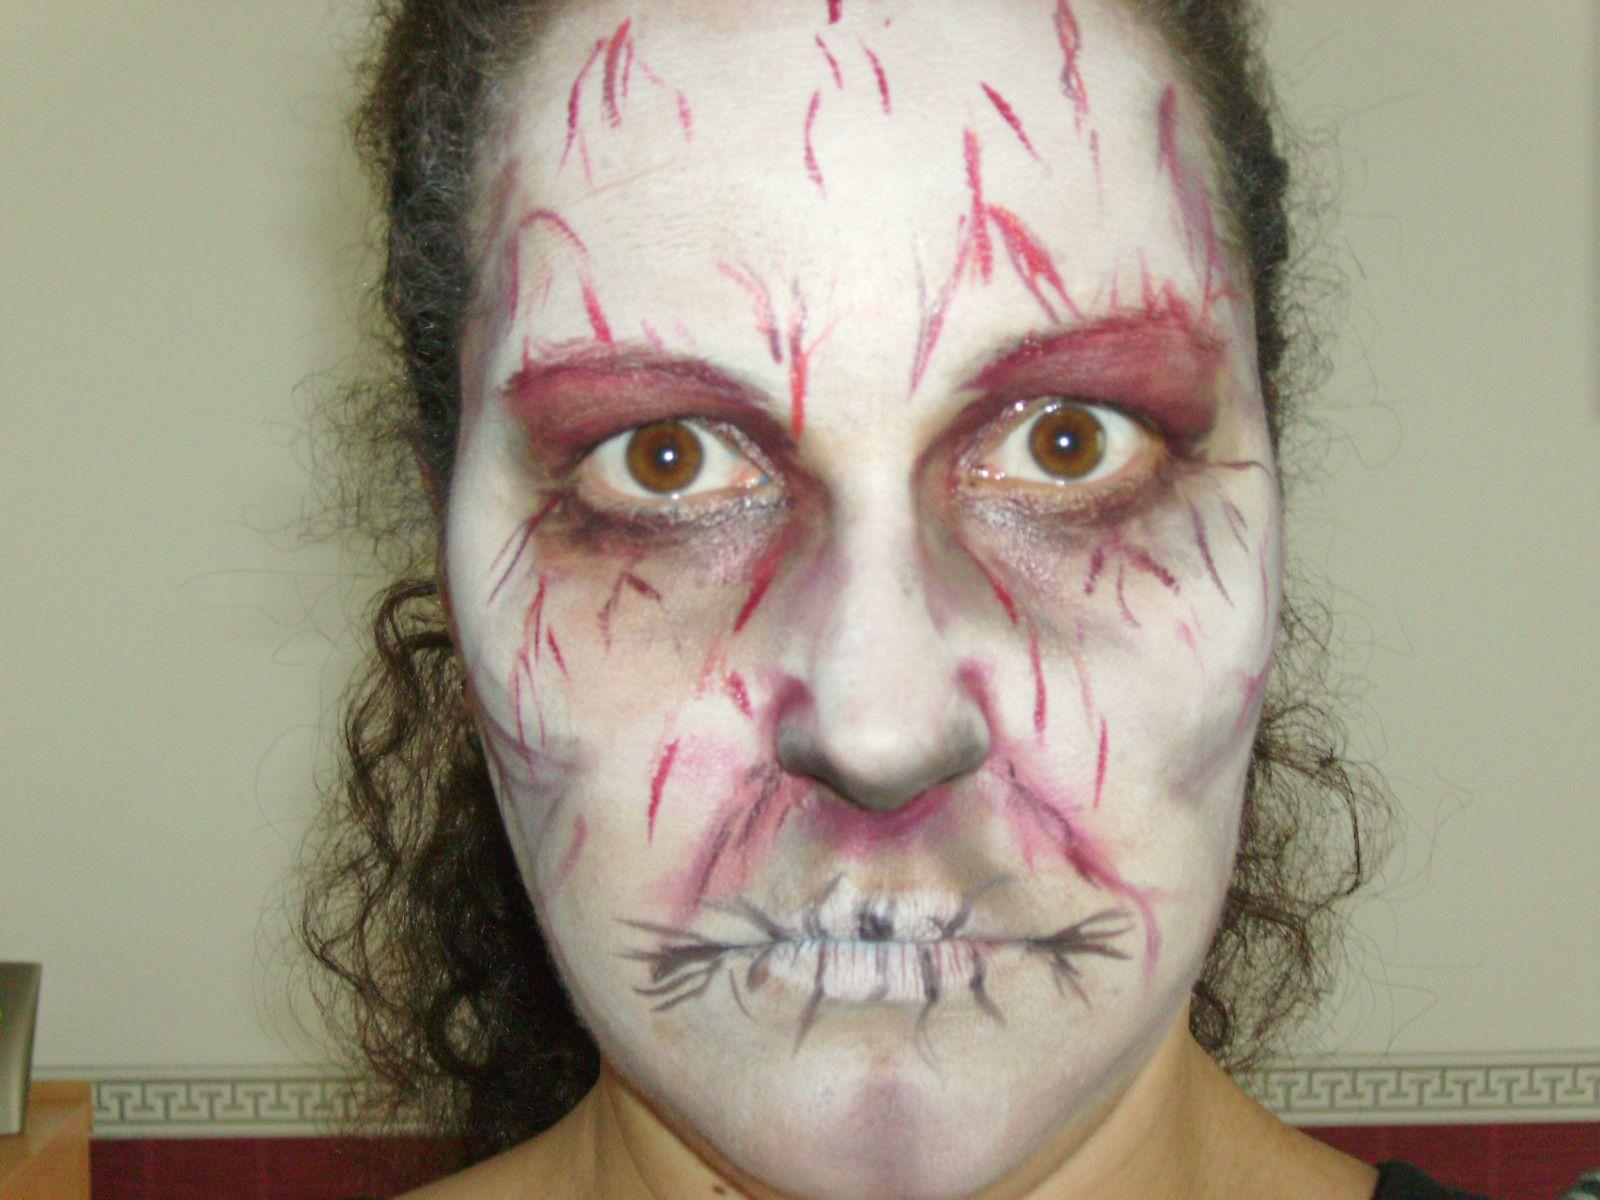 maquillage mort vivant sensible s 39 abstenir le blog de. Black Bedroom Furniture Sets. Home Design Ideas